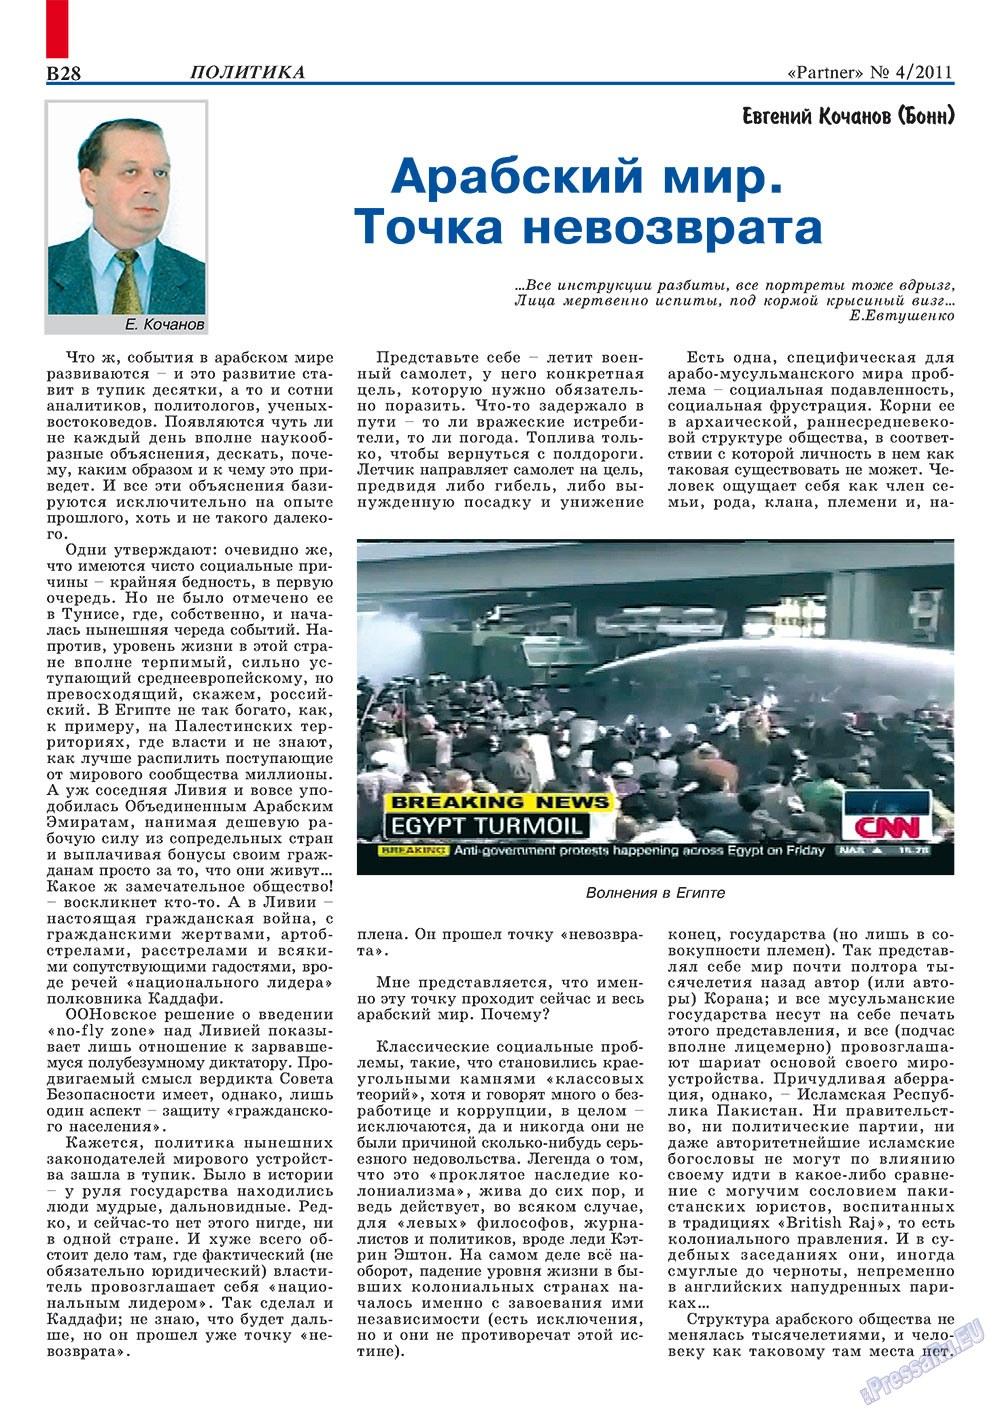 Партнер-север (журнал). 2011 год, номер 4, стр. 38